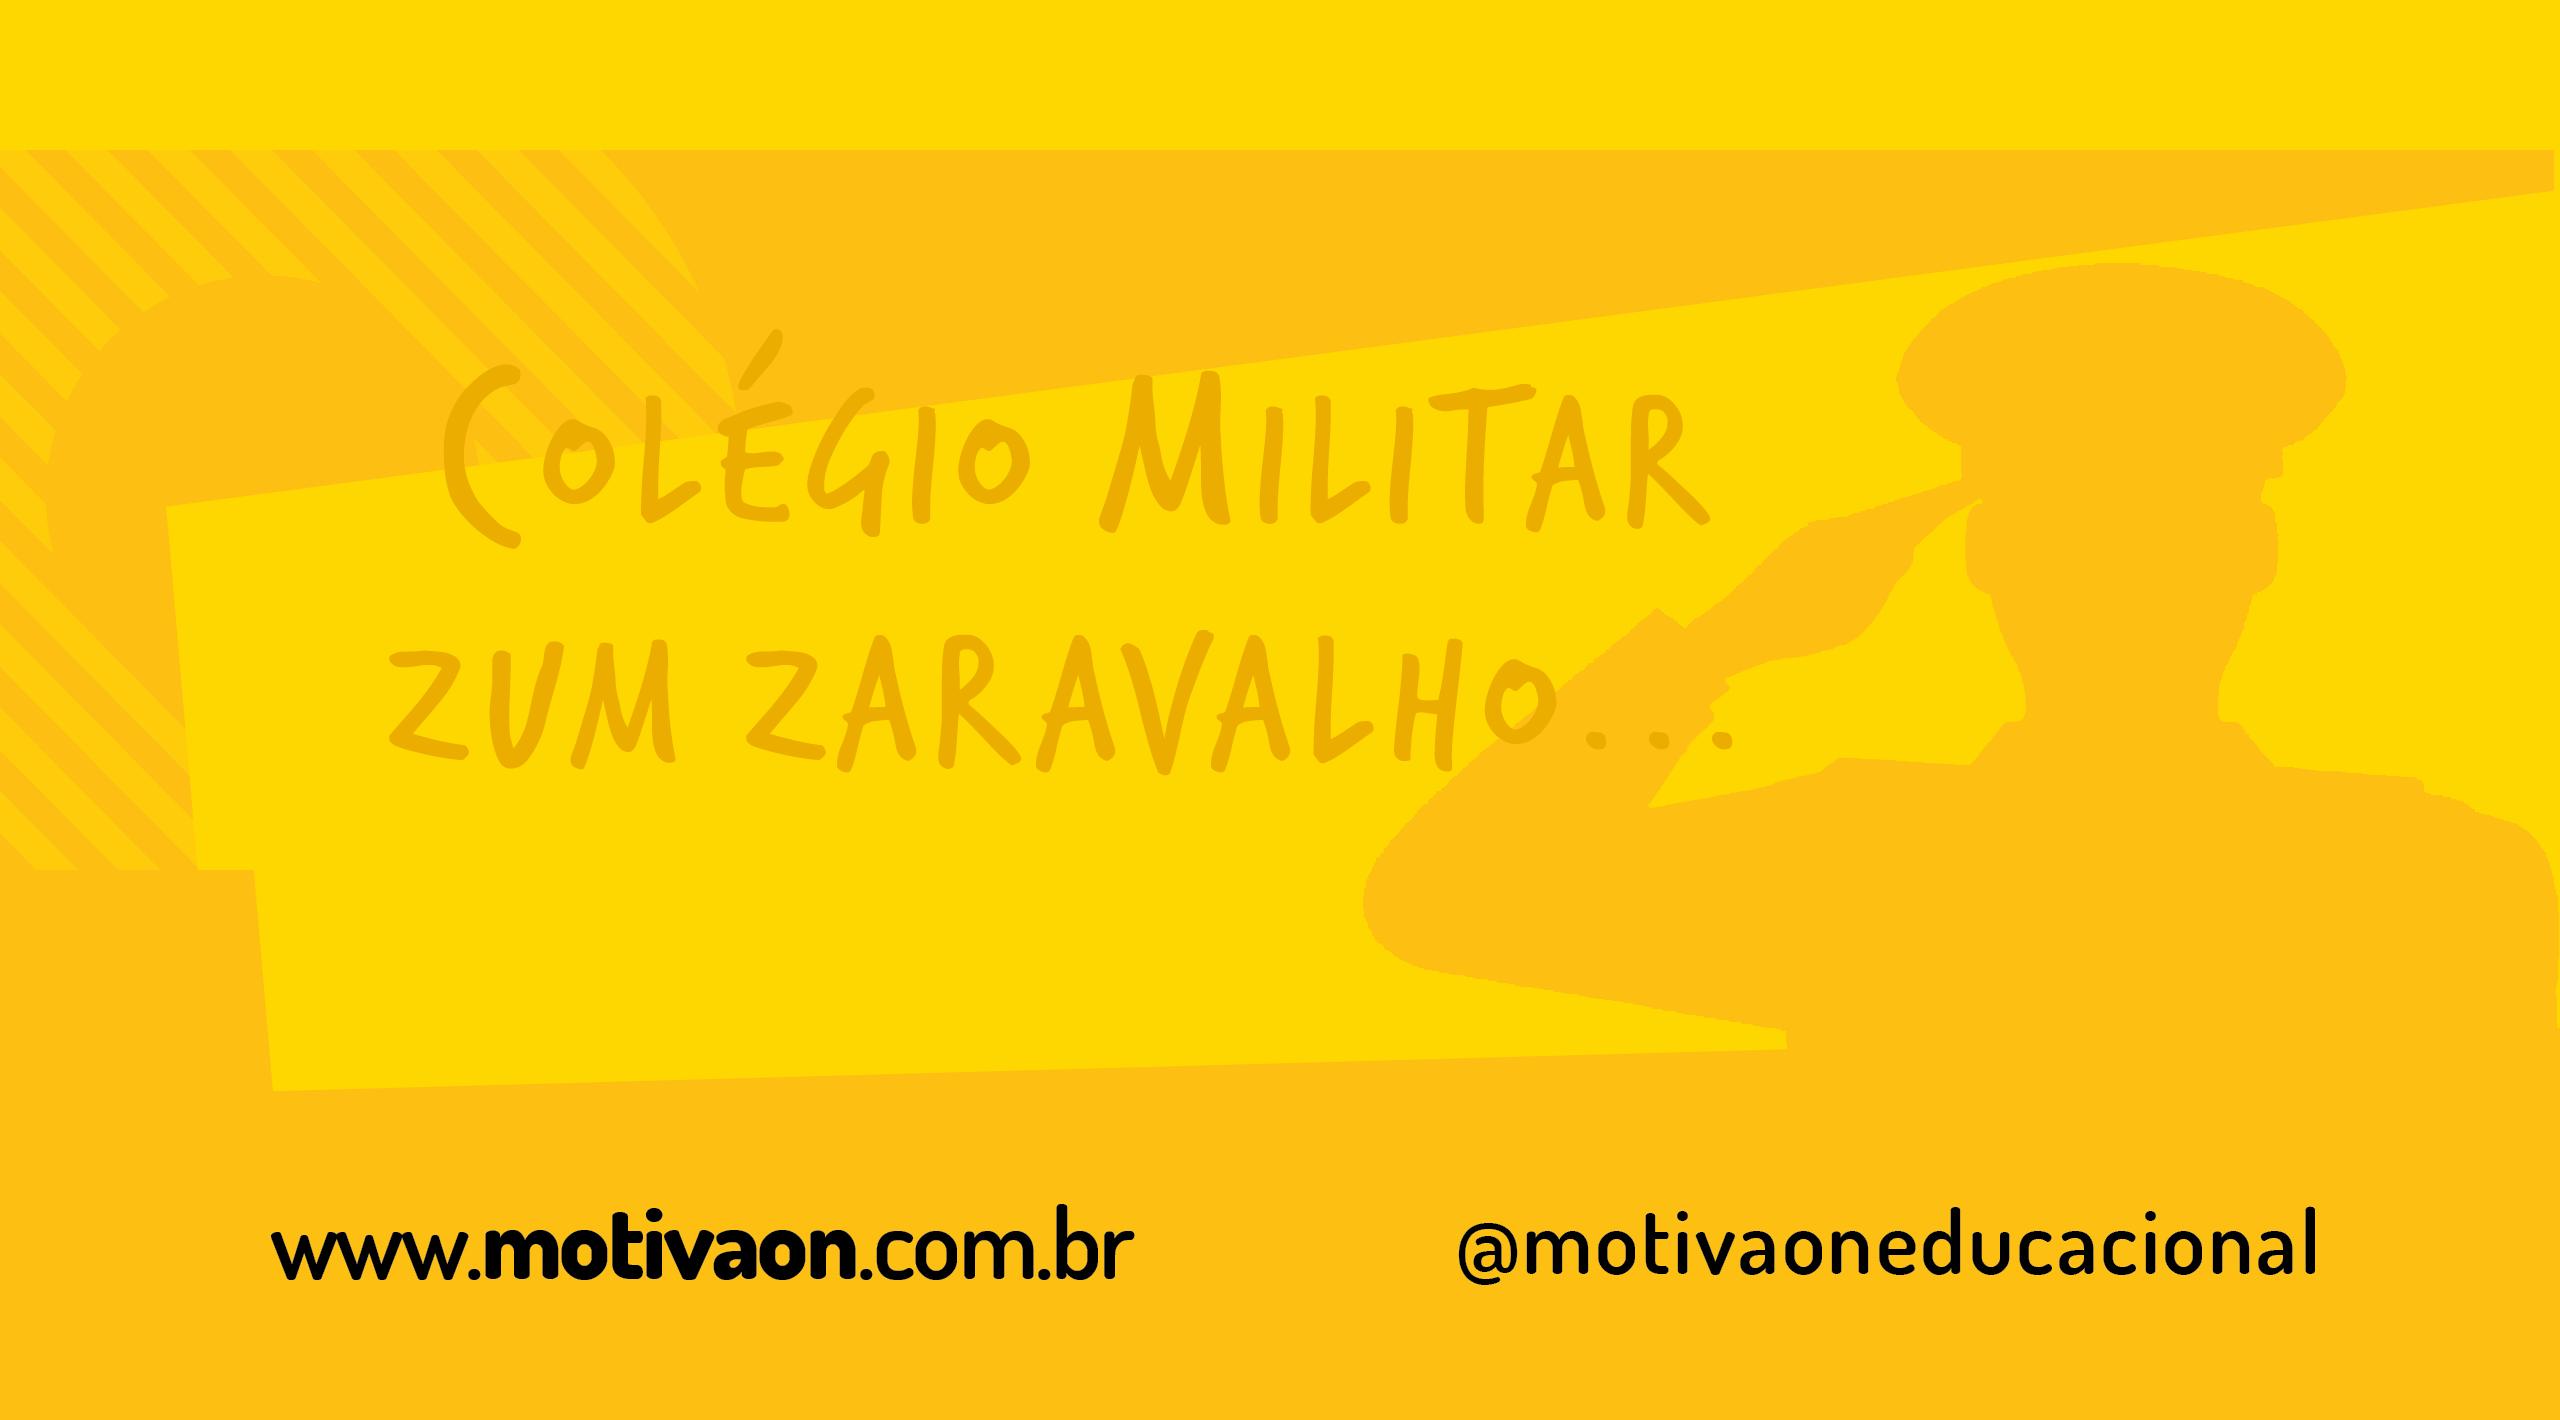 Motivaon cm4